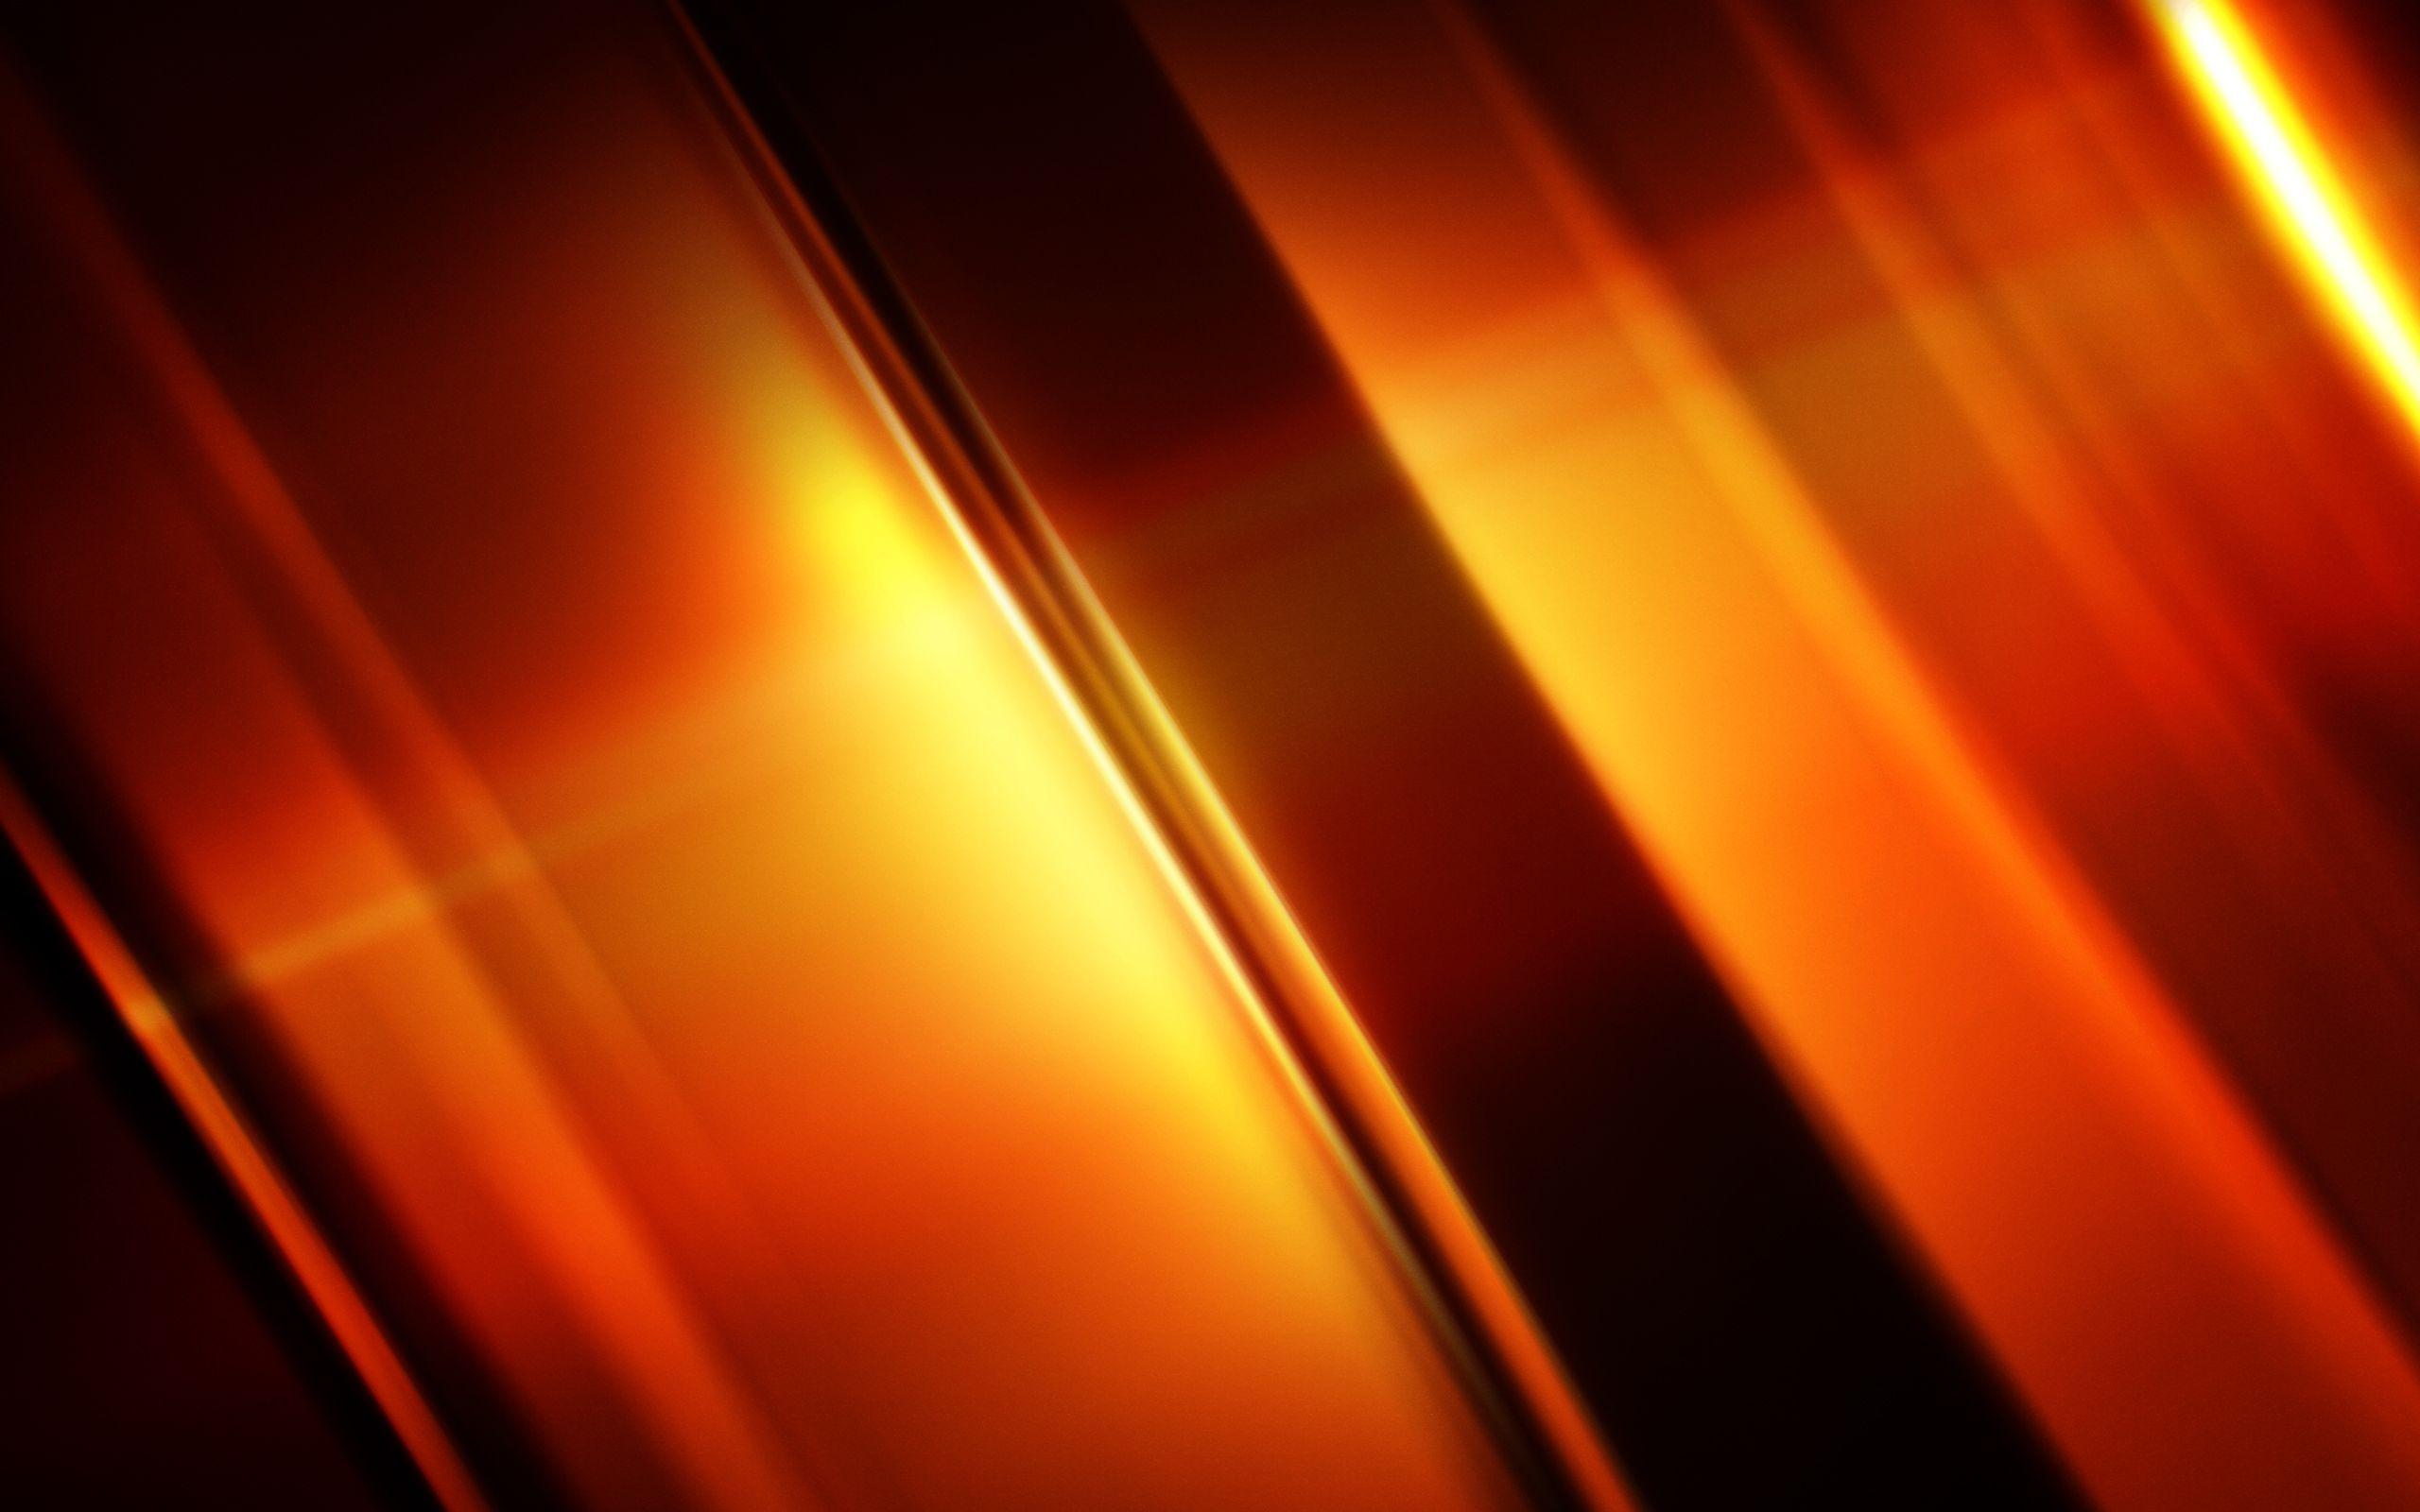 Orange Orange HD Wallpapers HD Wallpapers Arena COLOR